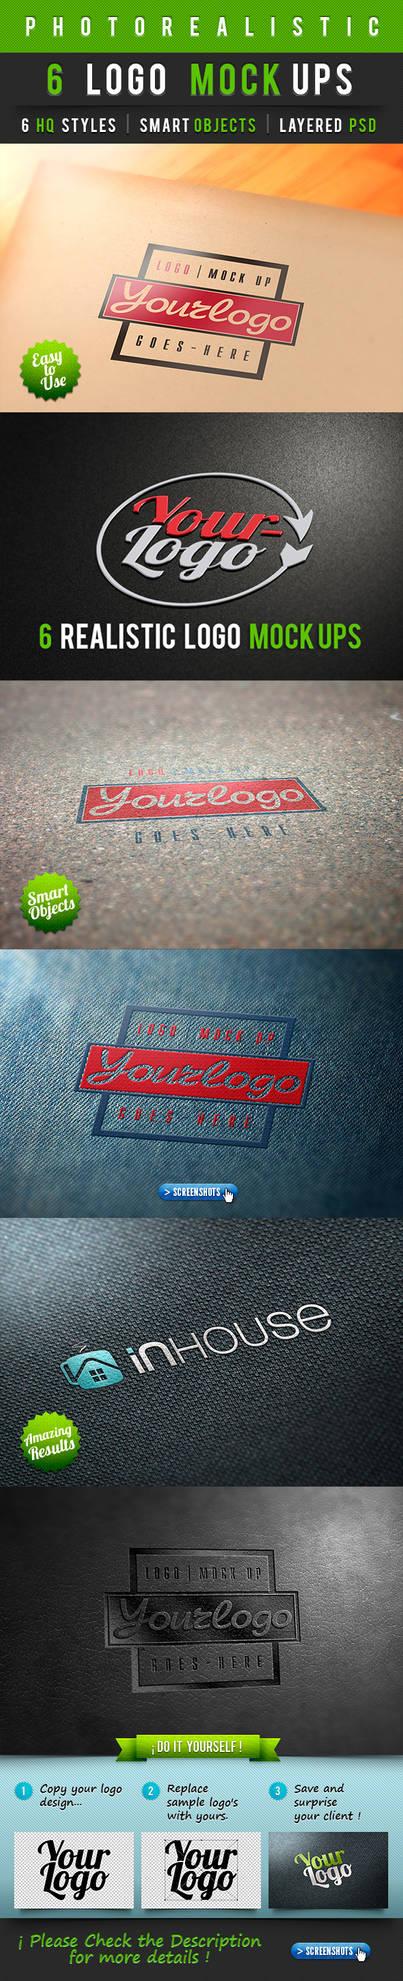 6 Photorealistic Logo Mock-Ups Vol.1 by Dee-A